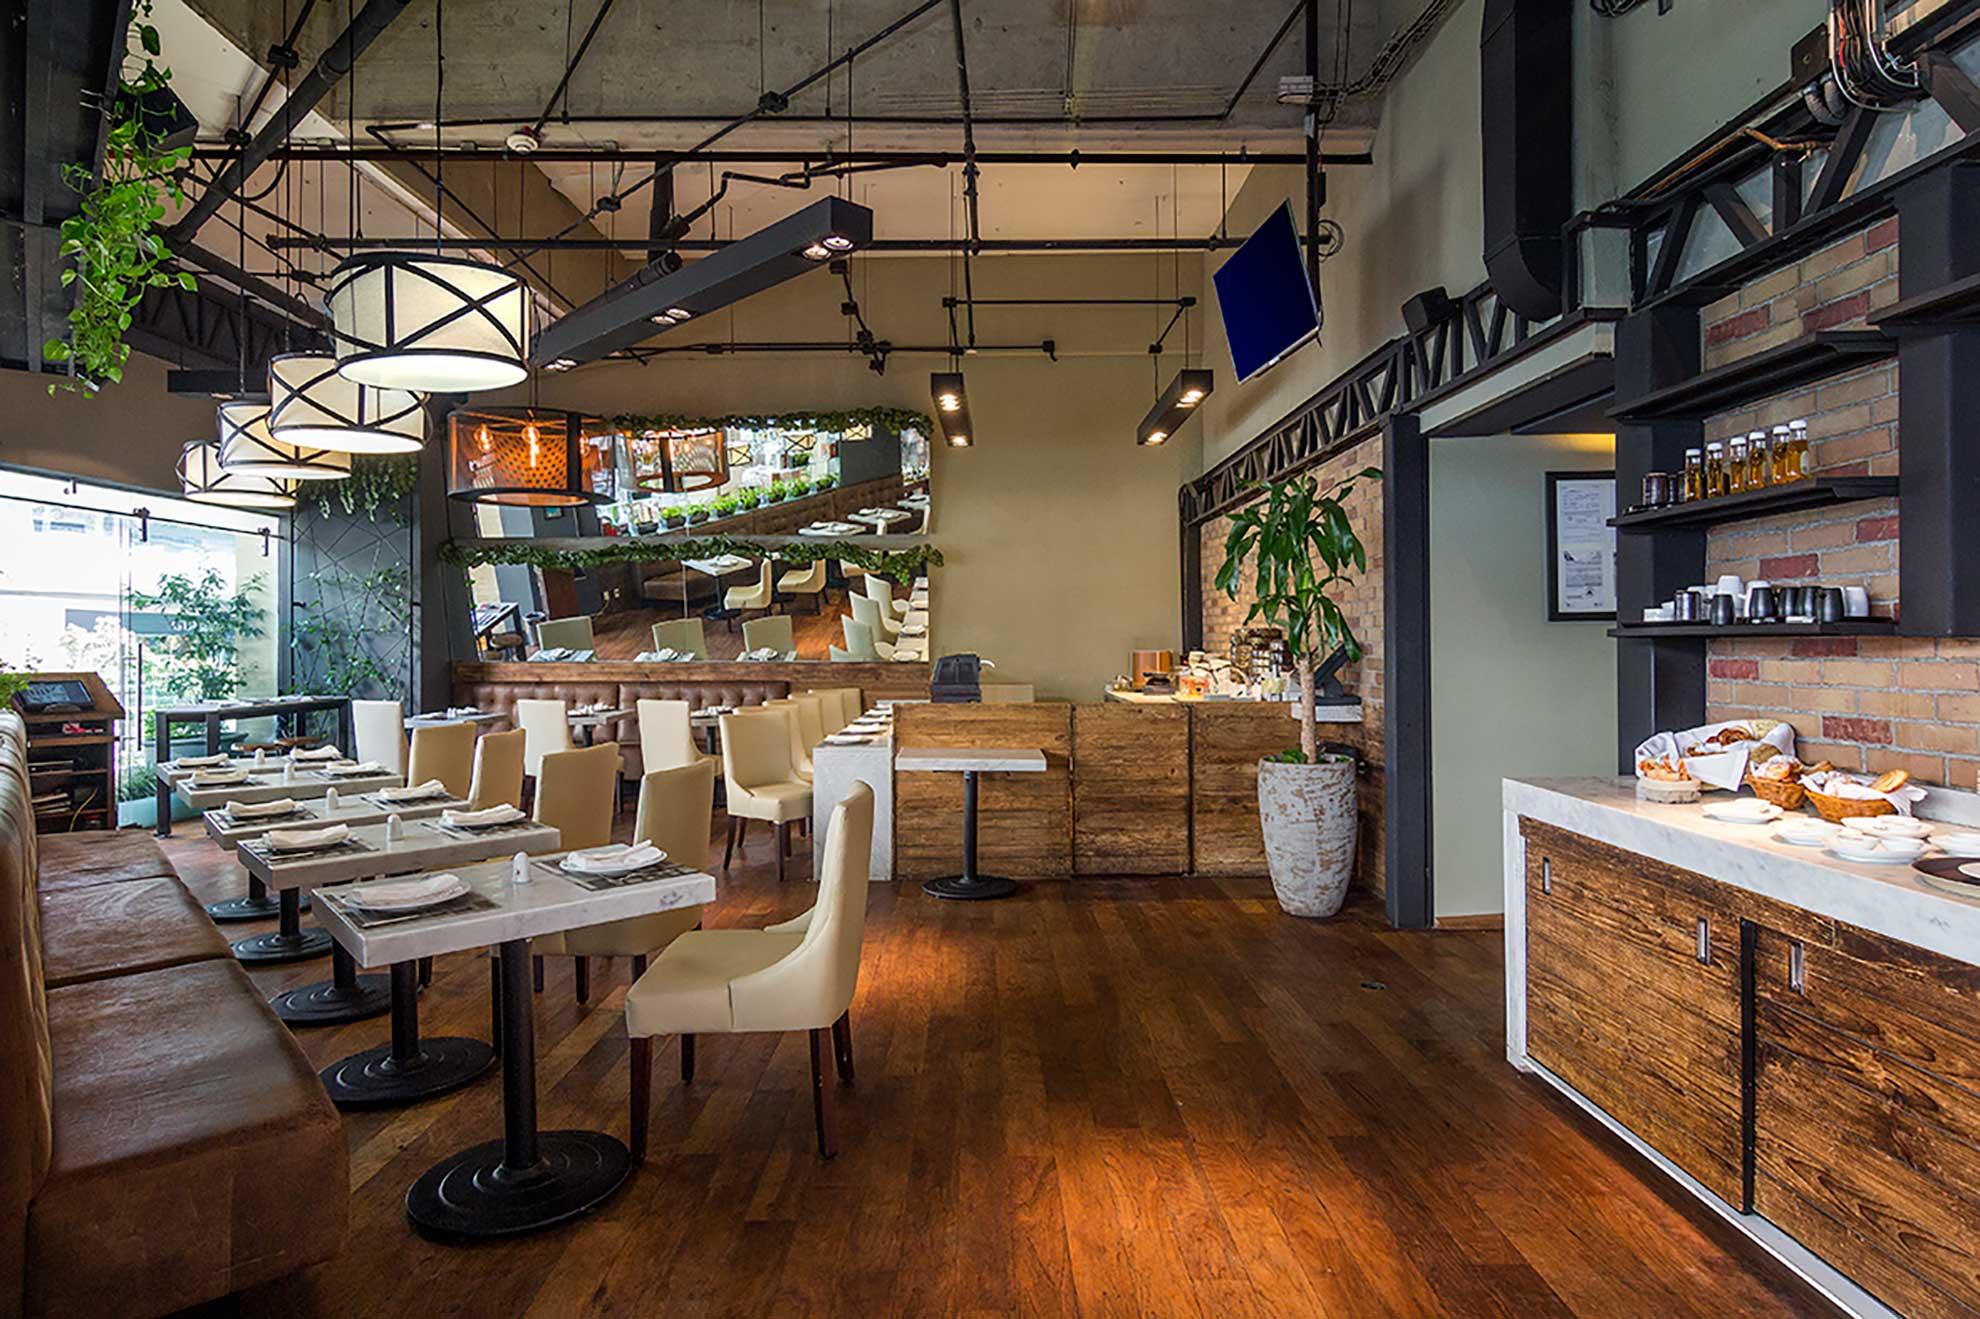 Dos restaurantes con una fusión de espacios ubicados en Antara Polanco, diseñados por Depa 102